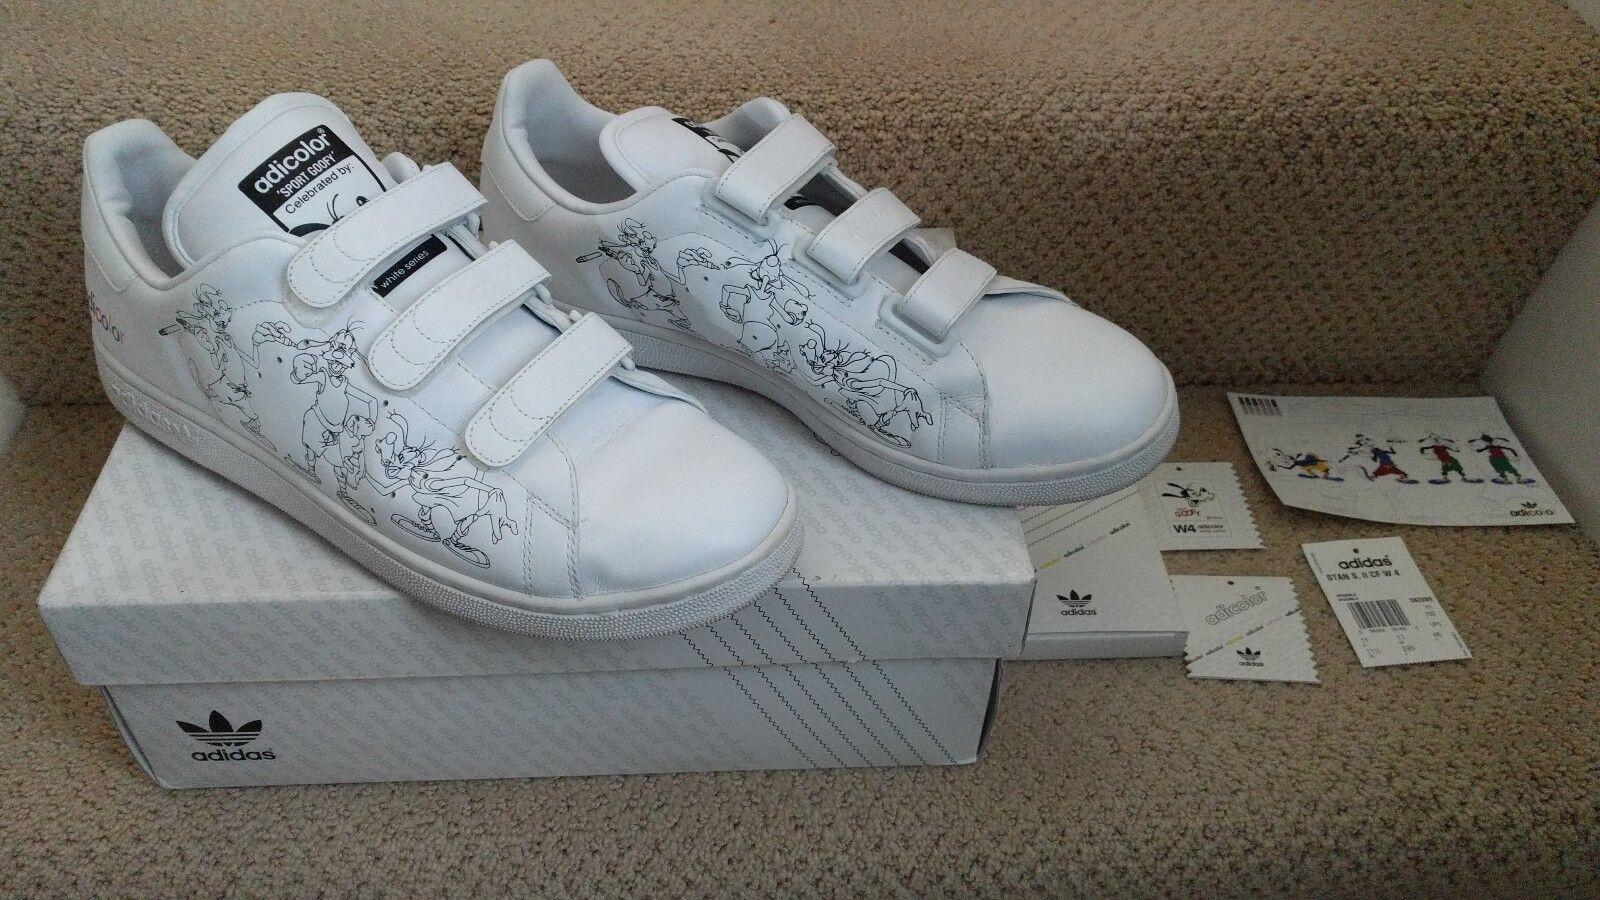 Adidas Stan Smith II 2 CF W4 Disney Goofy ADICOLOR White Black 11.5 RARE! Mint!